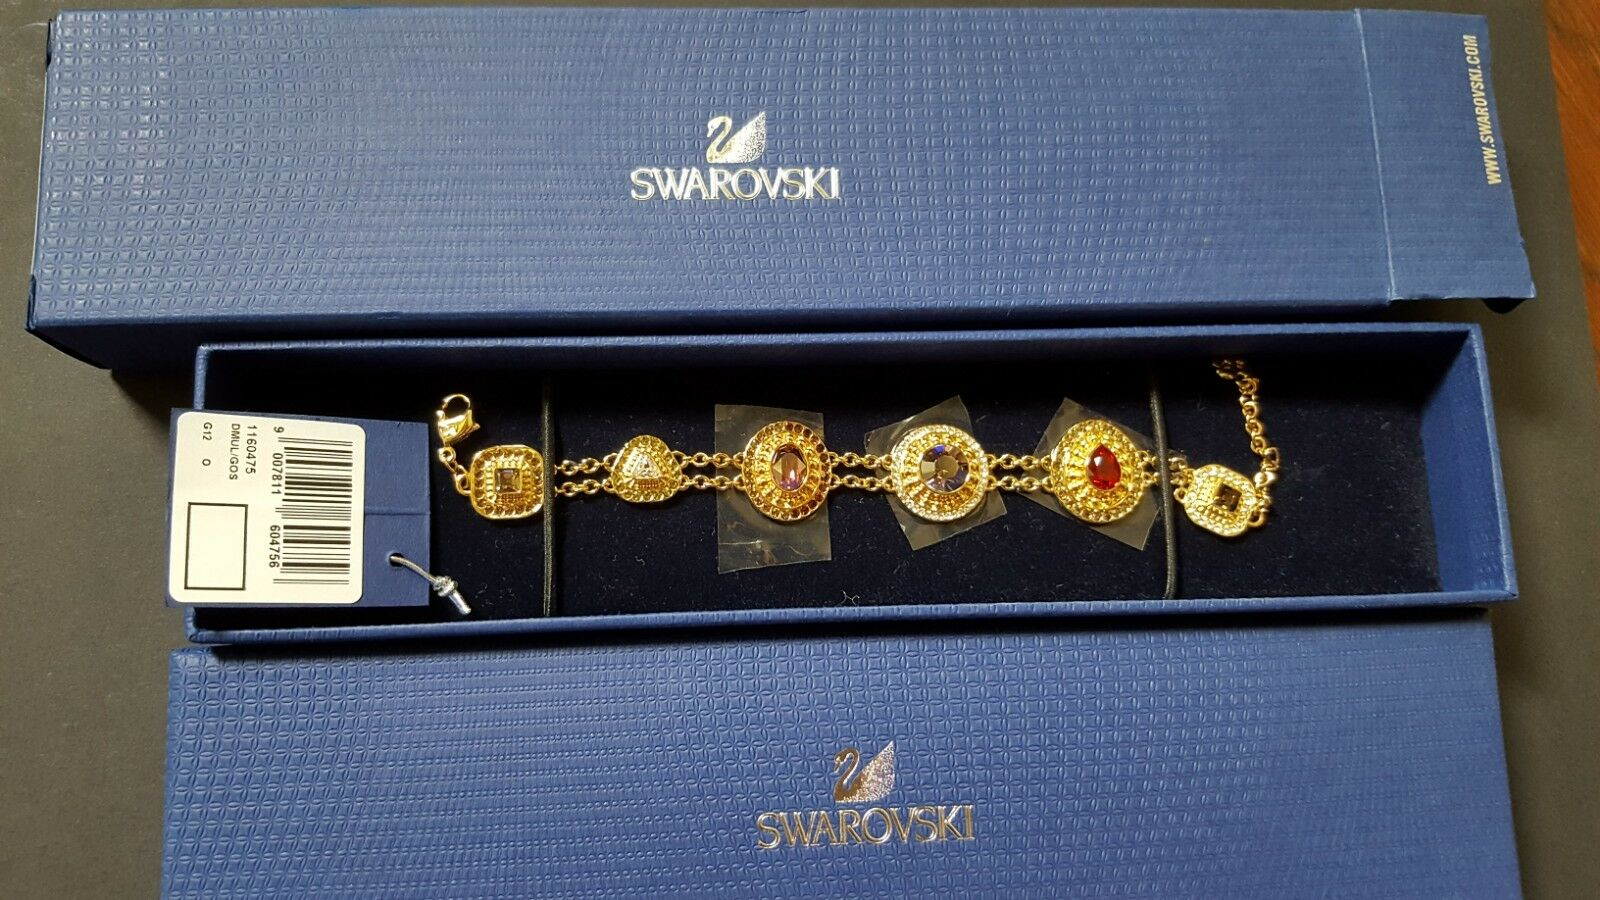 Swarovski Byzantine Bracelet - New